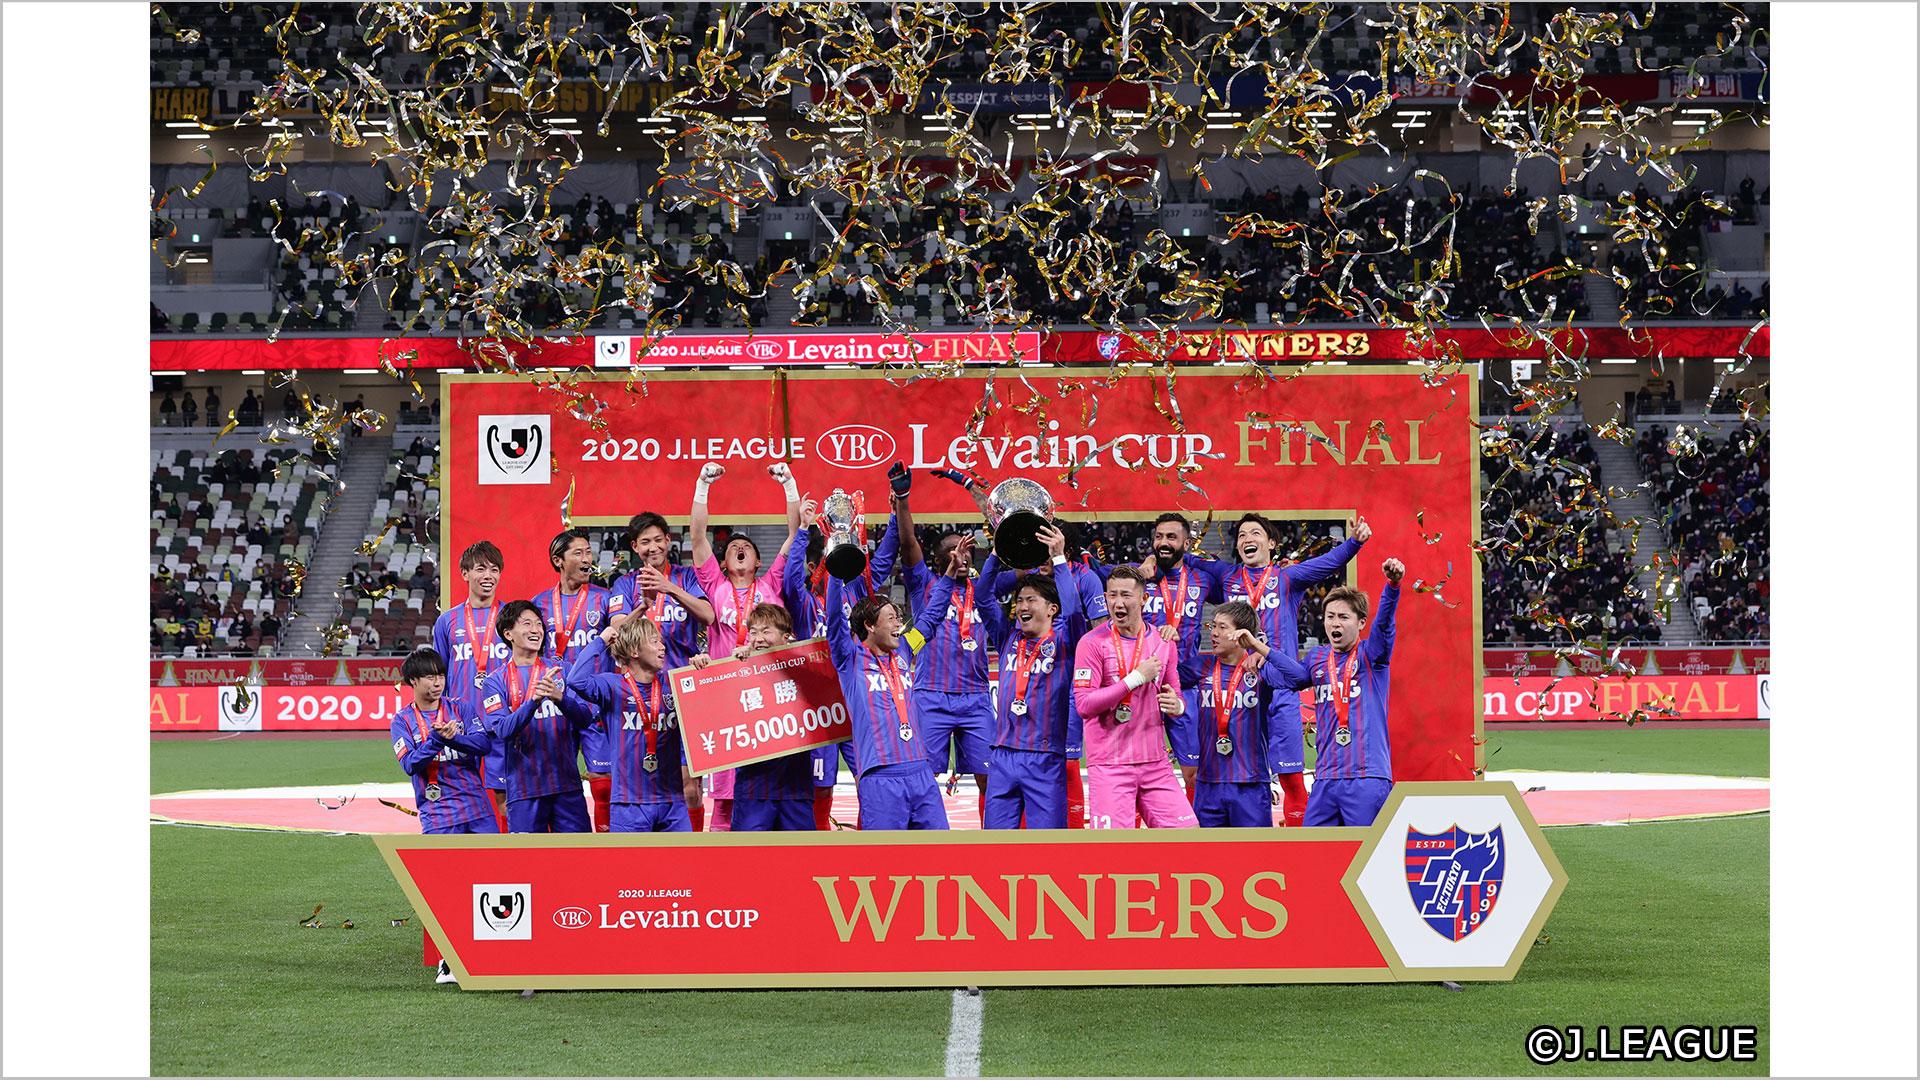 2021 JリーグYBCルヴァンカップ プライムステージ 準決勝 第1戦 名古屋グランパス vs FC東京